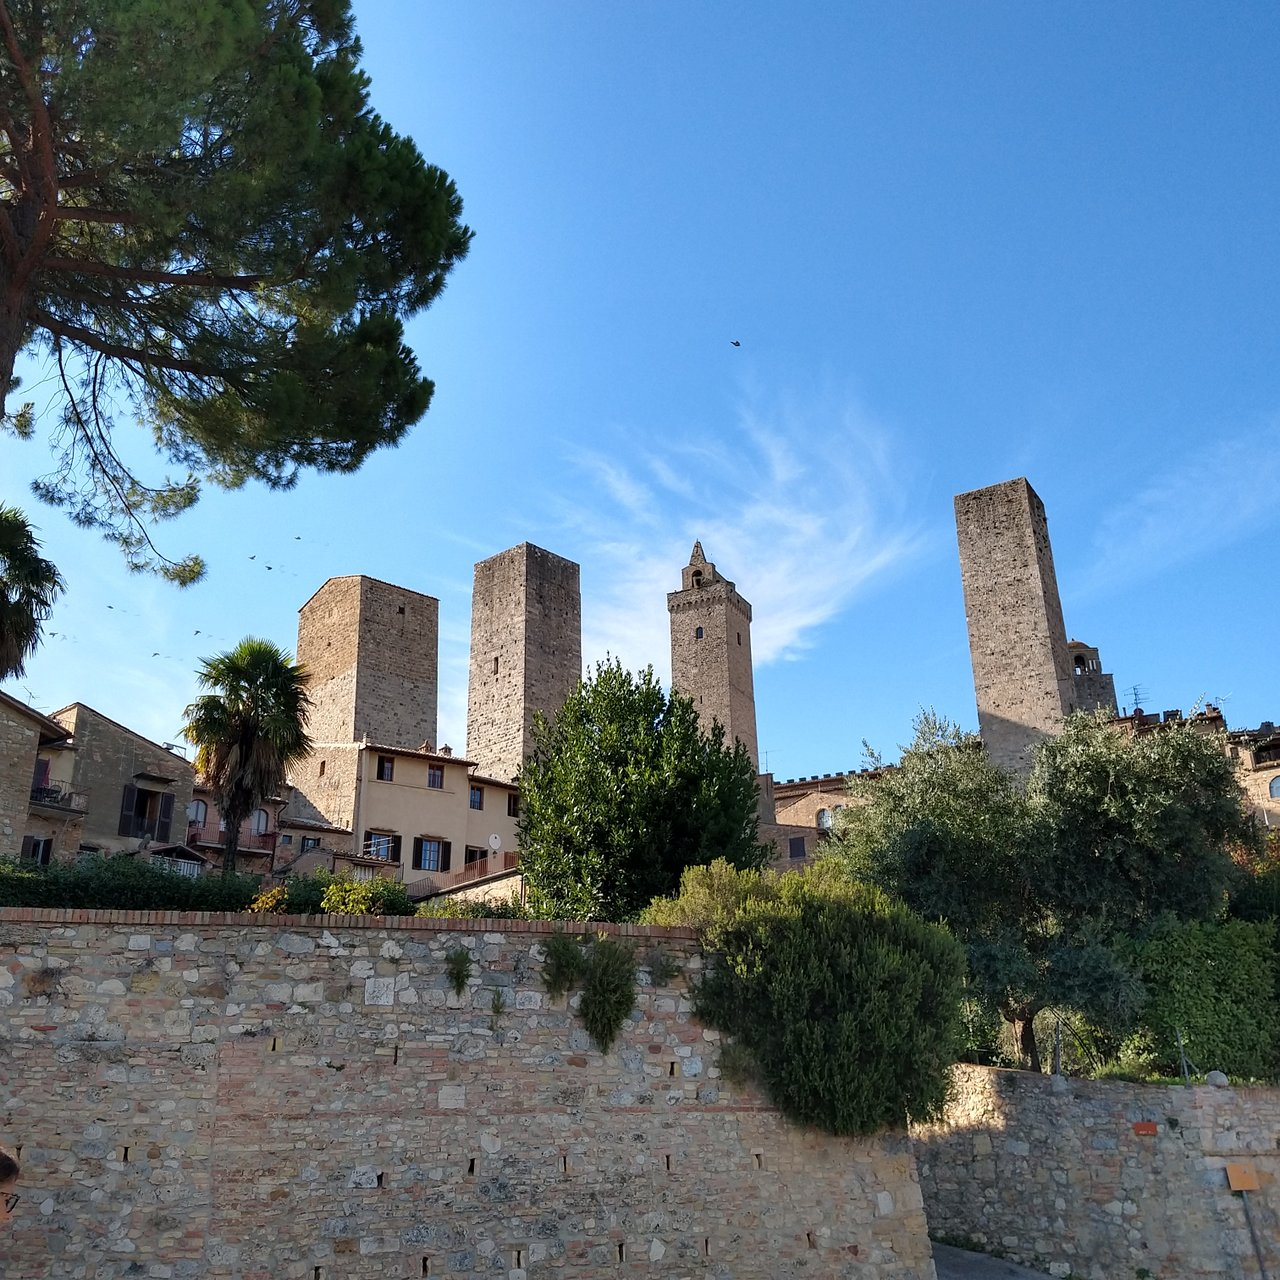 Mura Di San Gimignano 2021 All You Need To Know Before You Go With Photos Tripadvisor